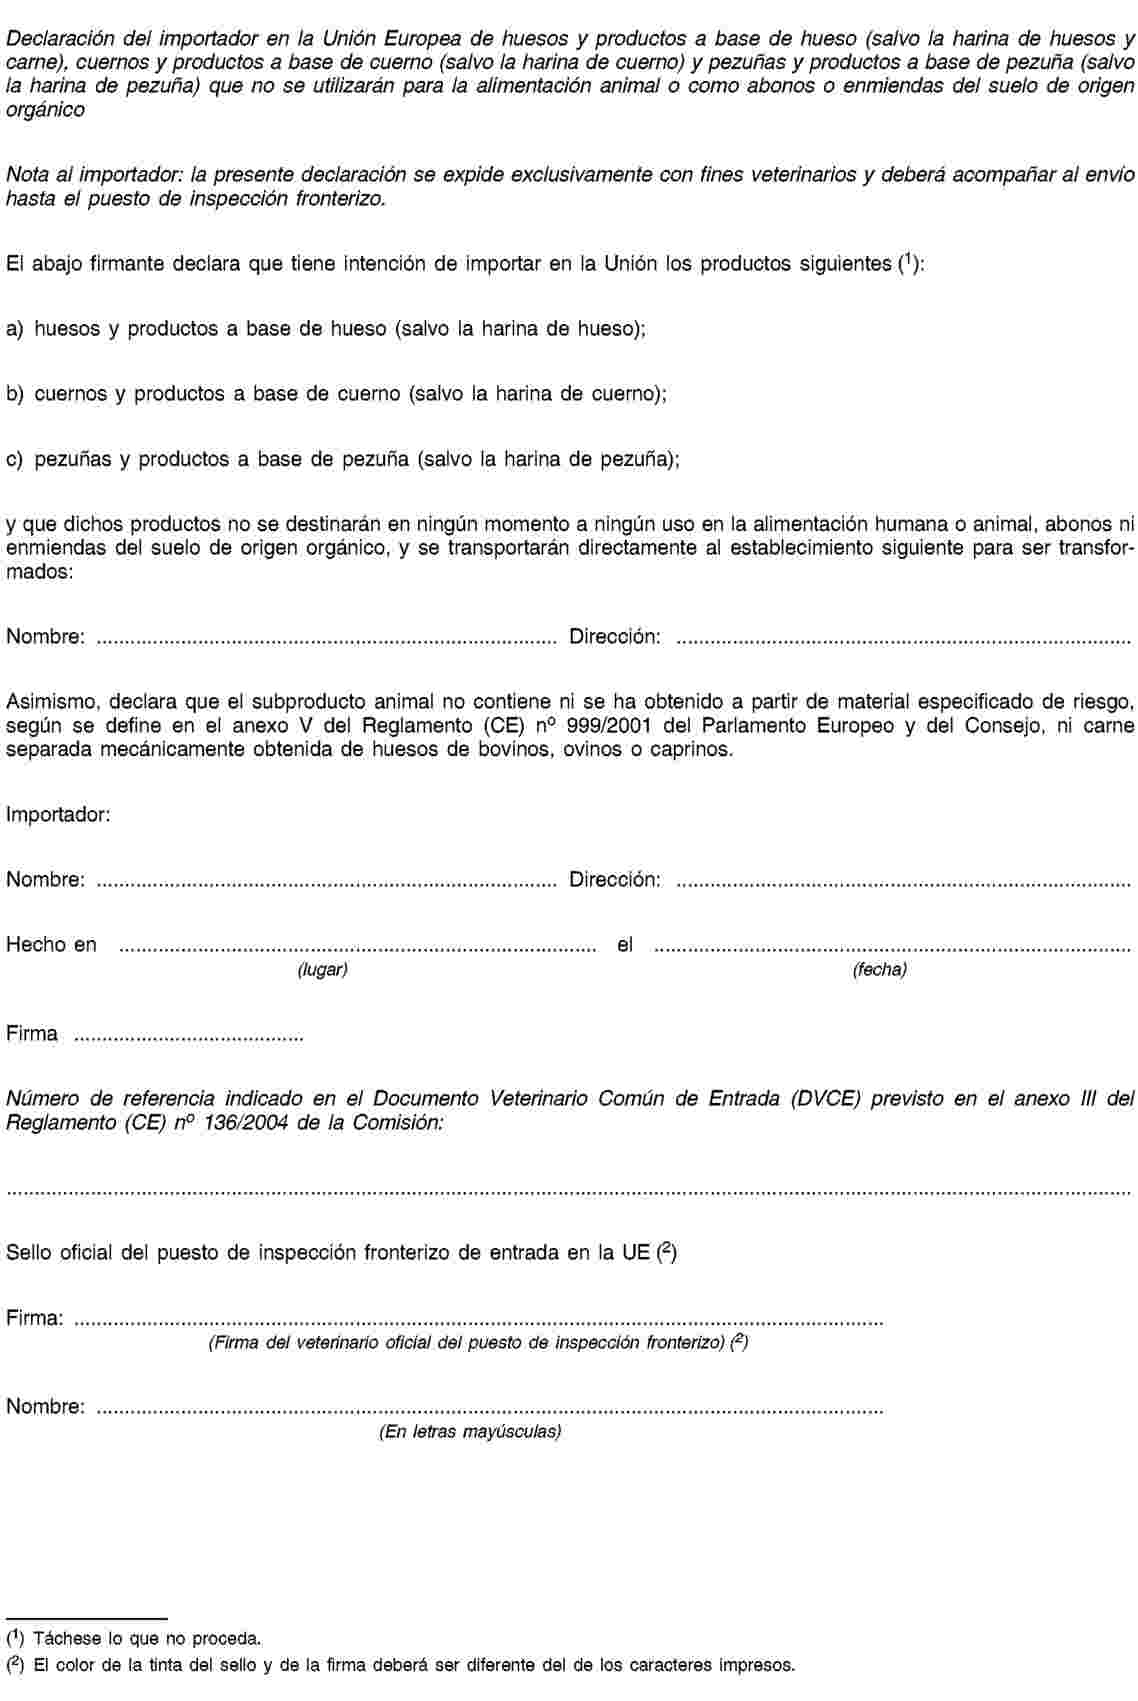 Imagen: https://eur-lex.europa.eu/resource.html?uri=uriserv:OJ.L_.2011.054.01.0001.01.SPA.xhtml.L_2011054ES.01023501.tif.jpg